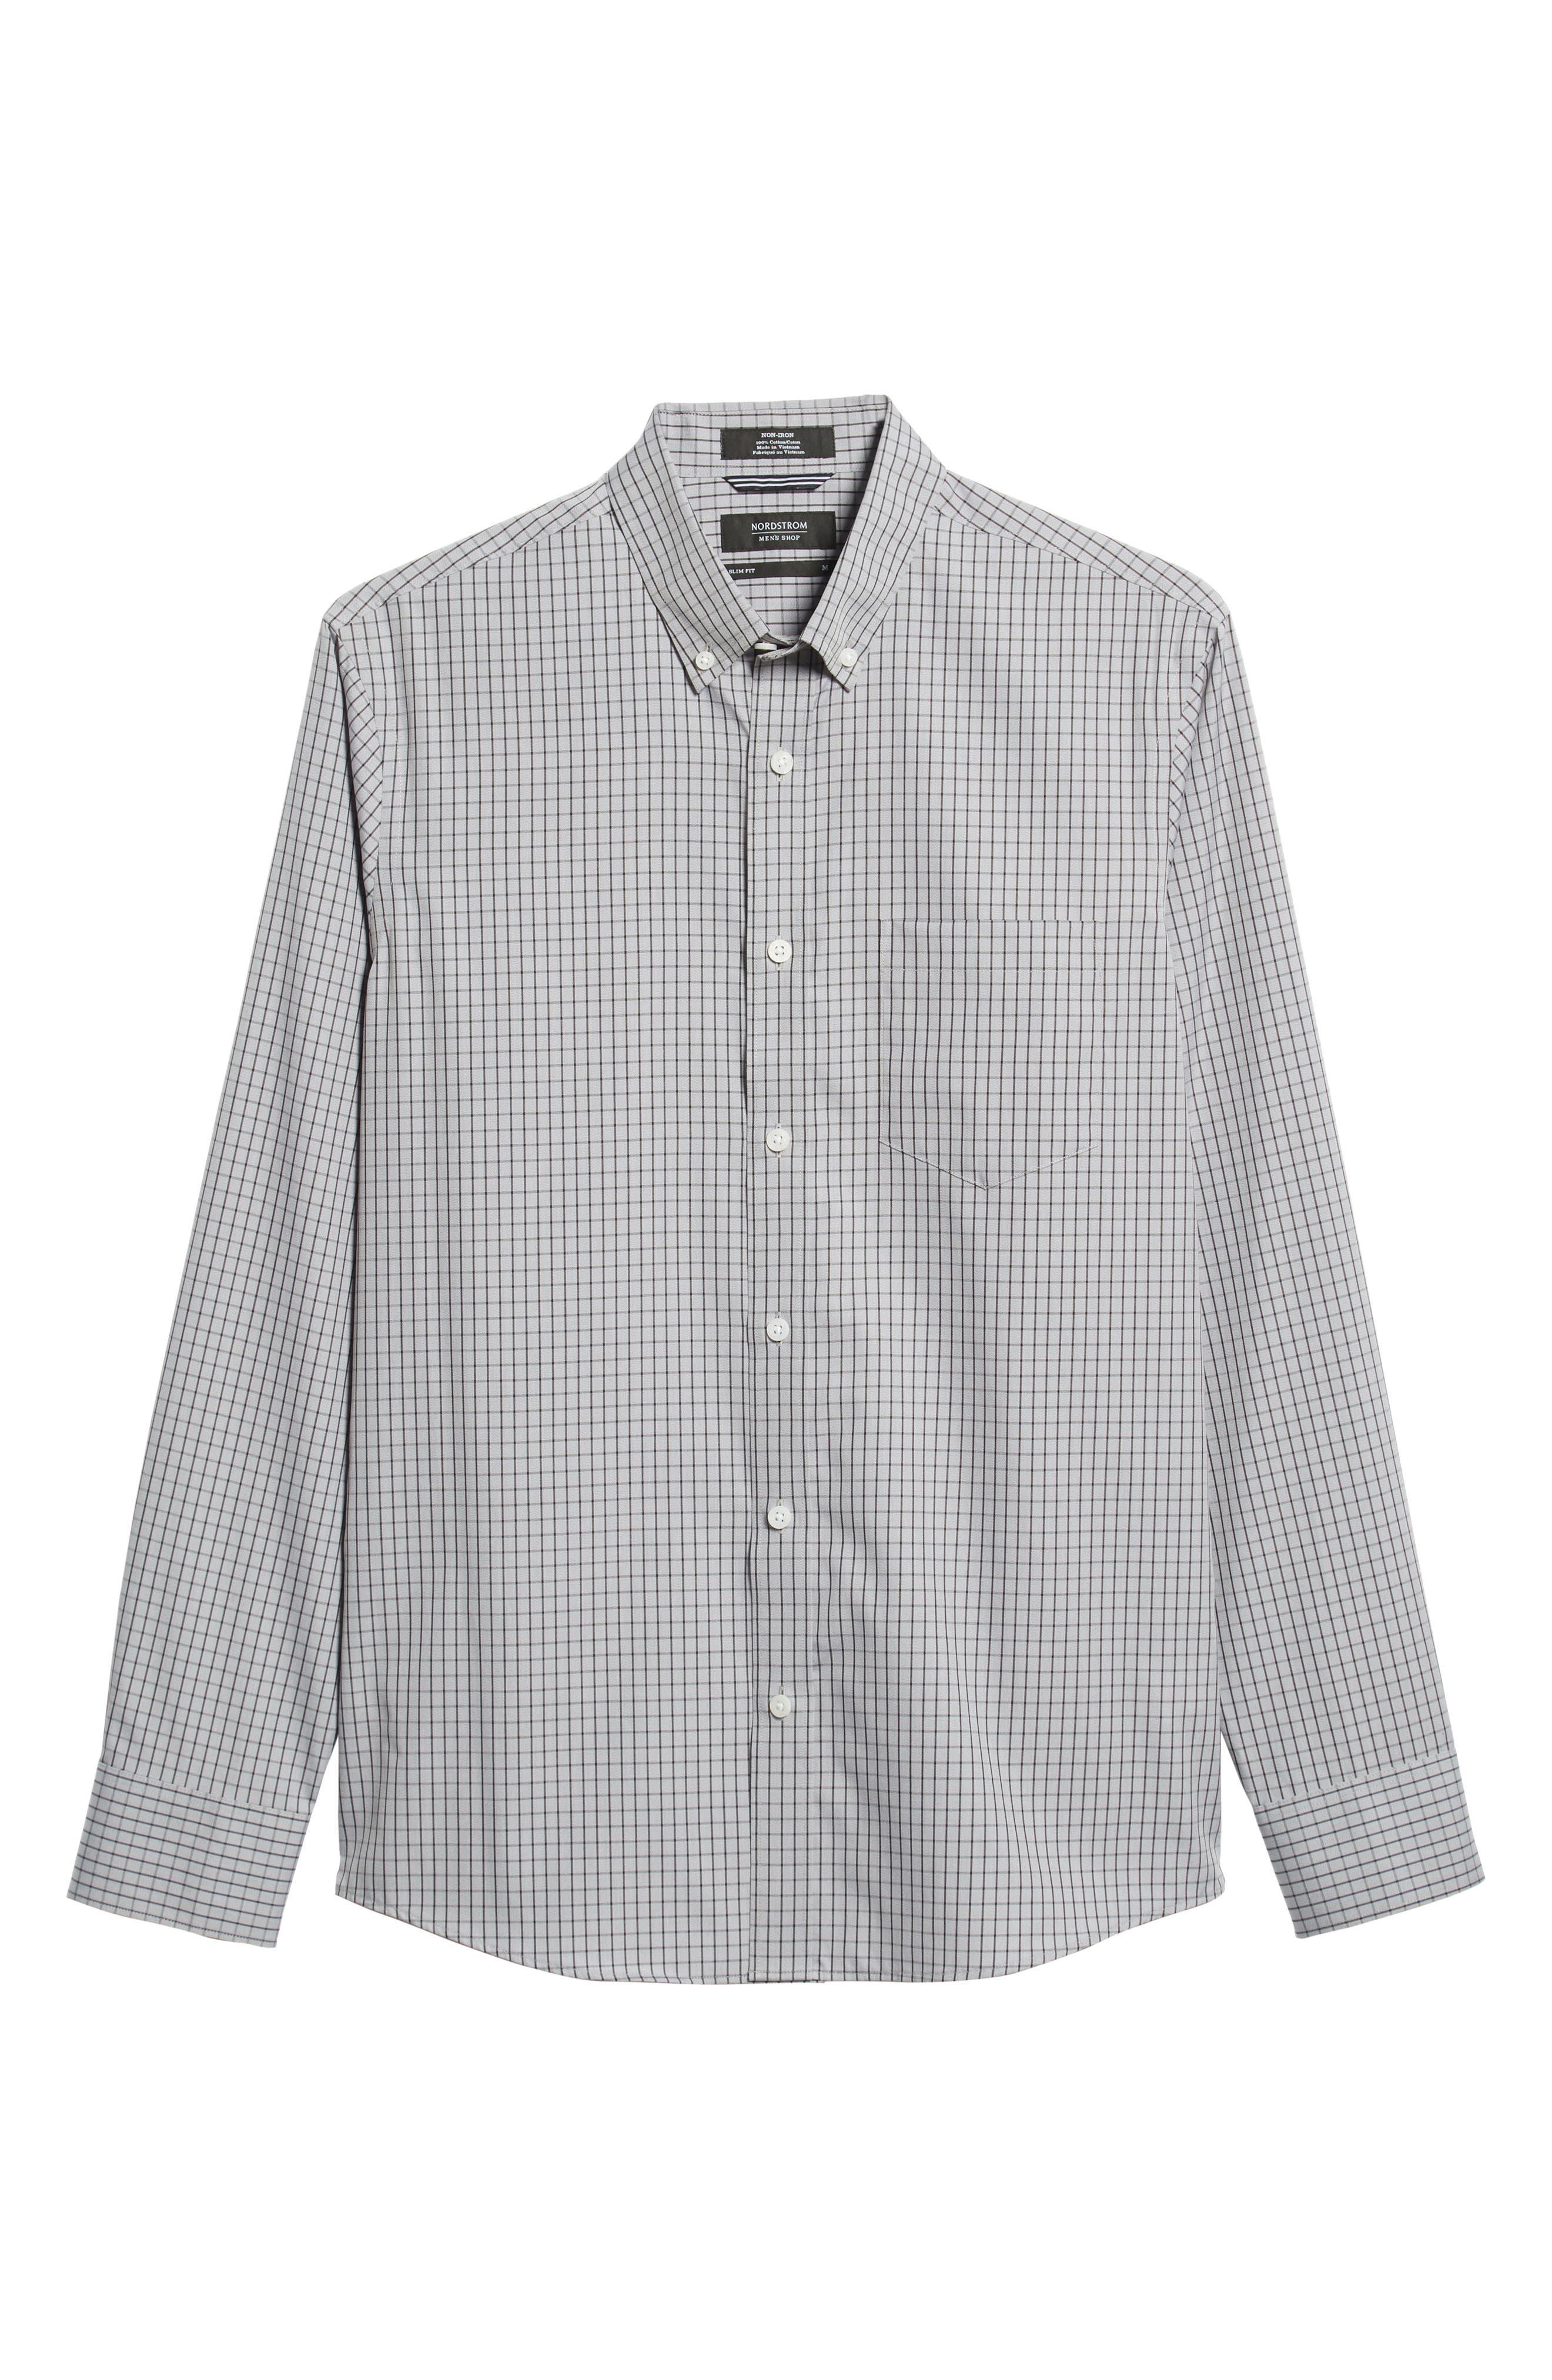 NORDSTROM MEN'S SHOP,                             Trim Fit Non-Iron Check Sport Shirt,                             Alternate thumbnail 5, color,                             GREY FILIGREE MINIGRID